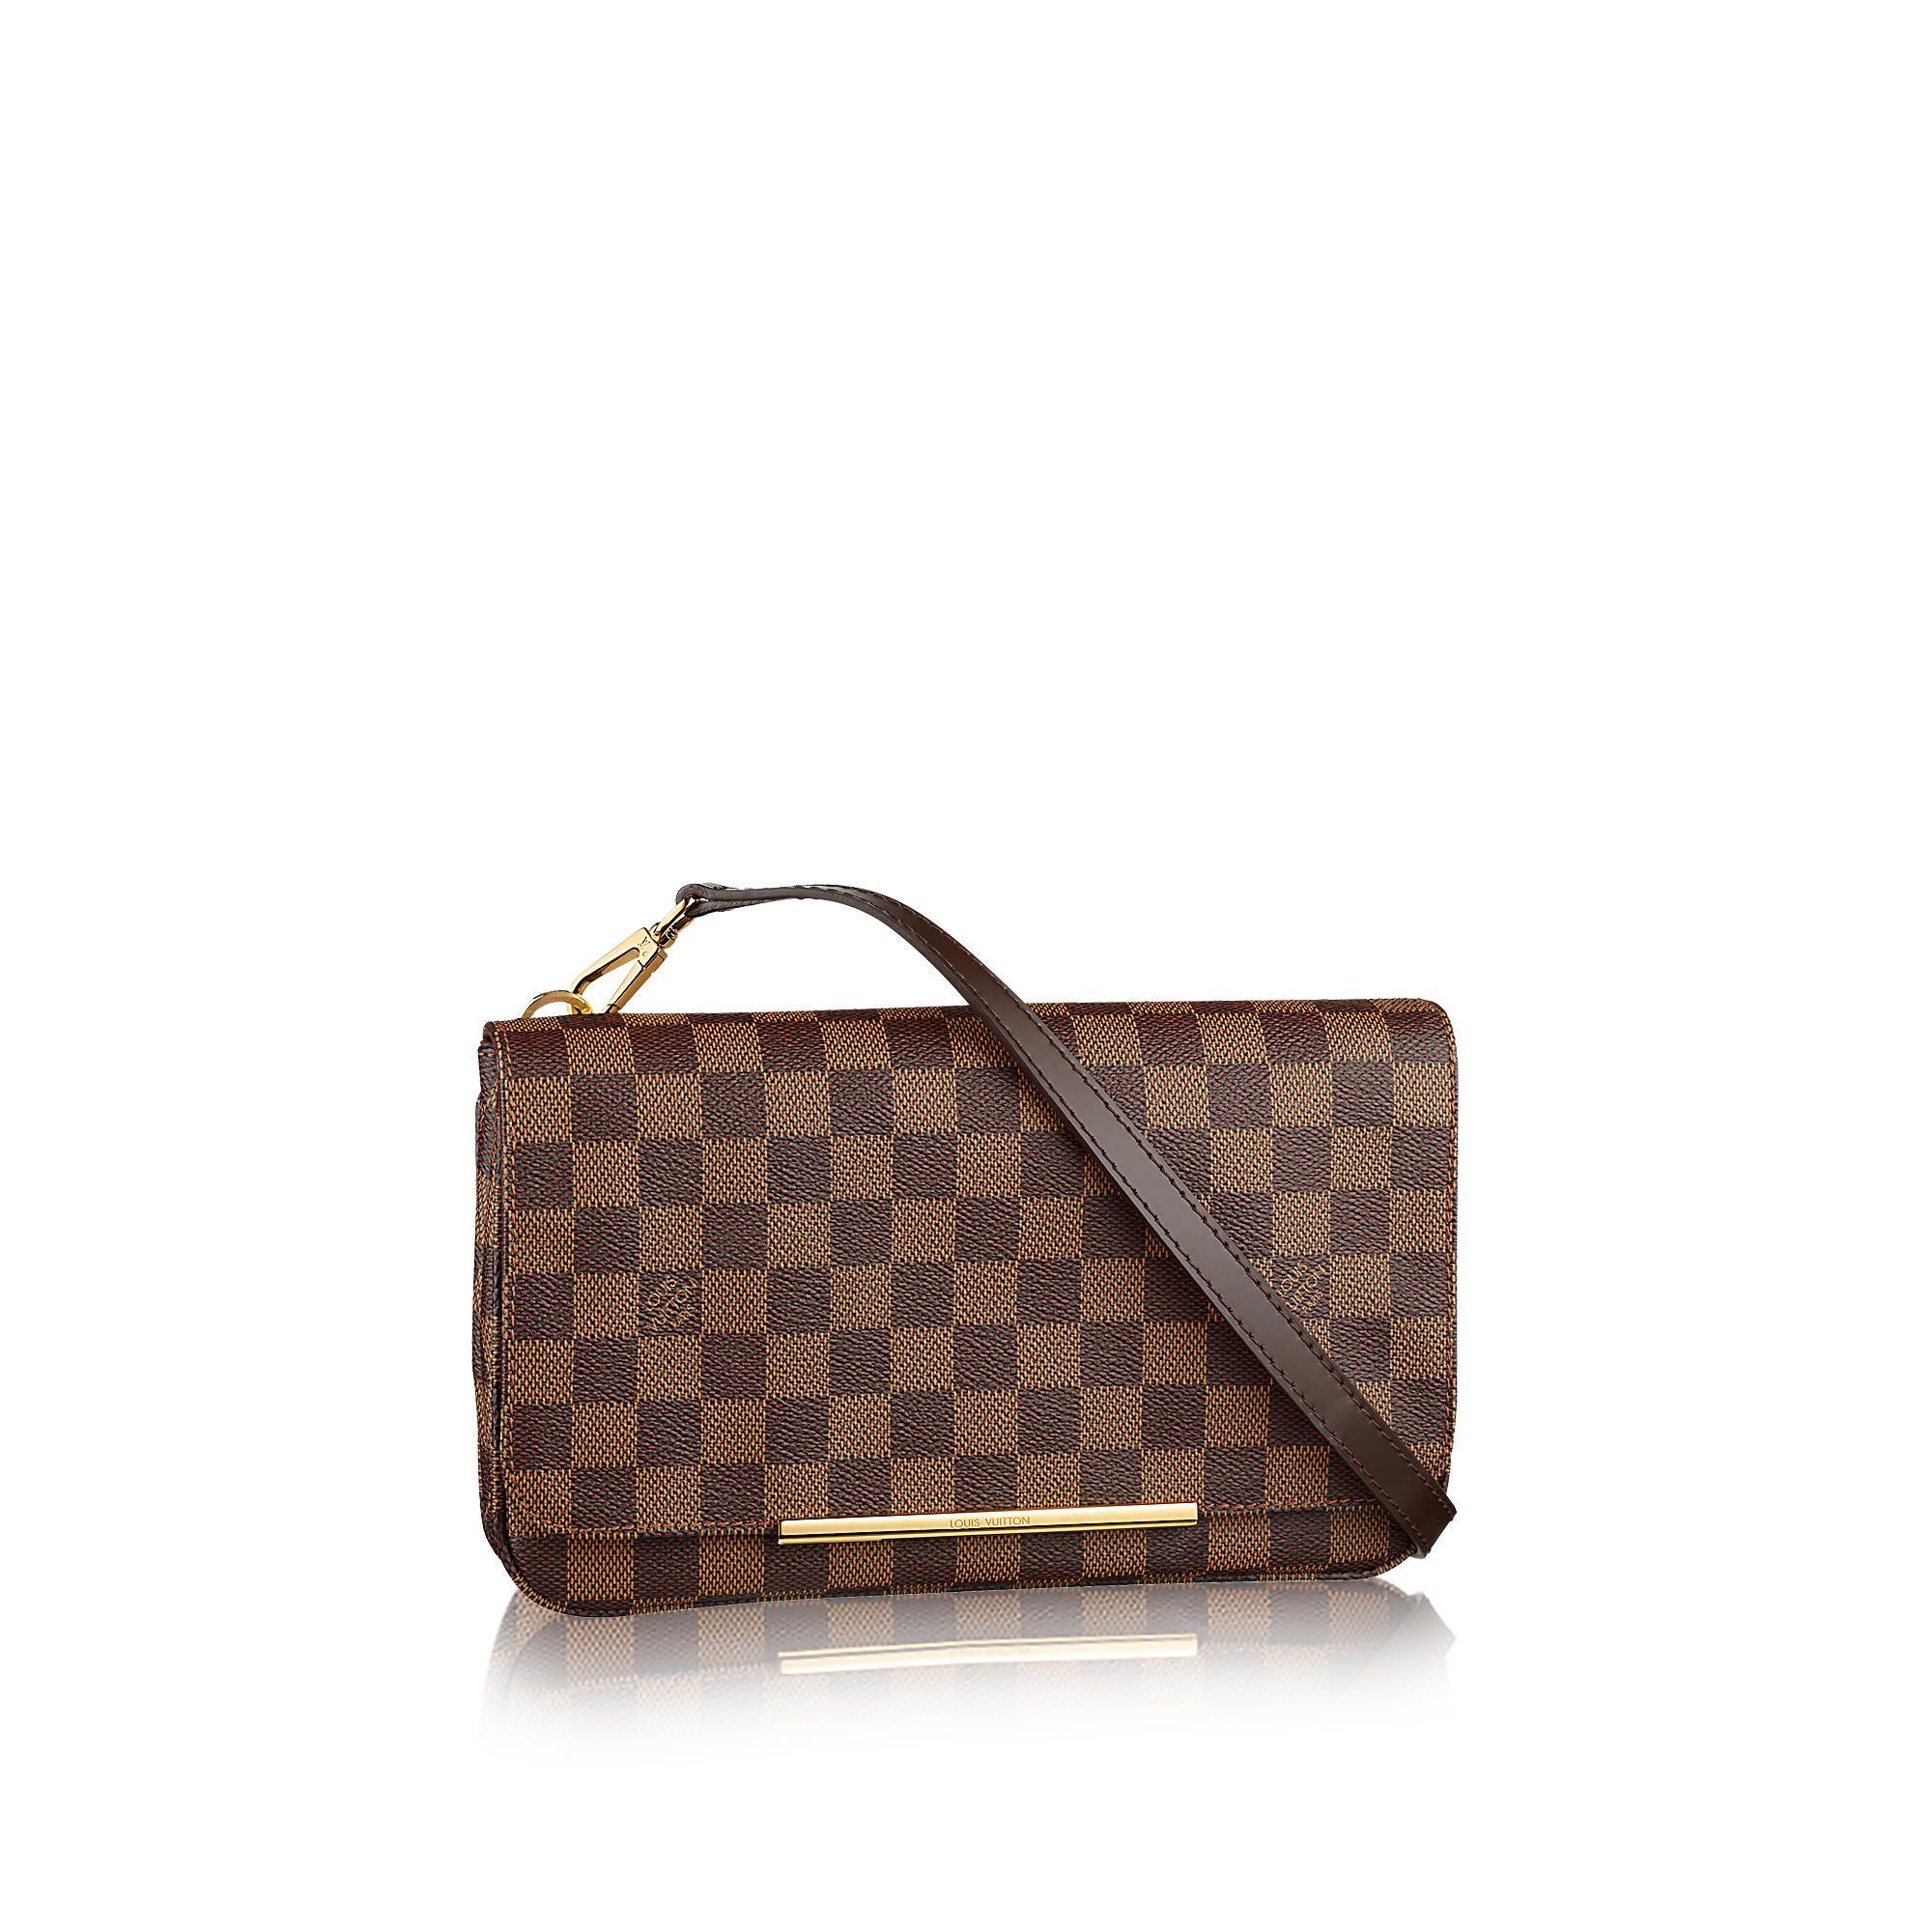 Hoxton PM via Louis Vuitton